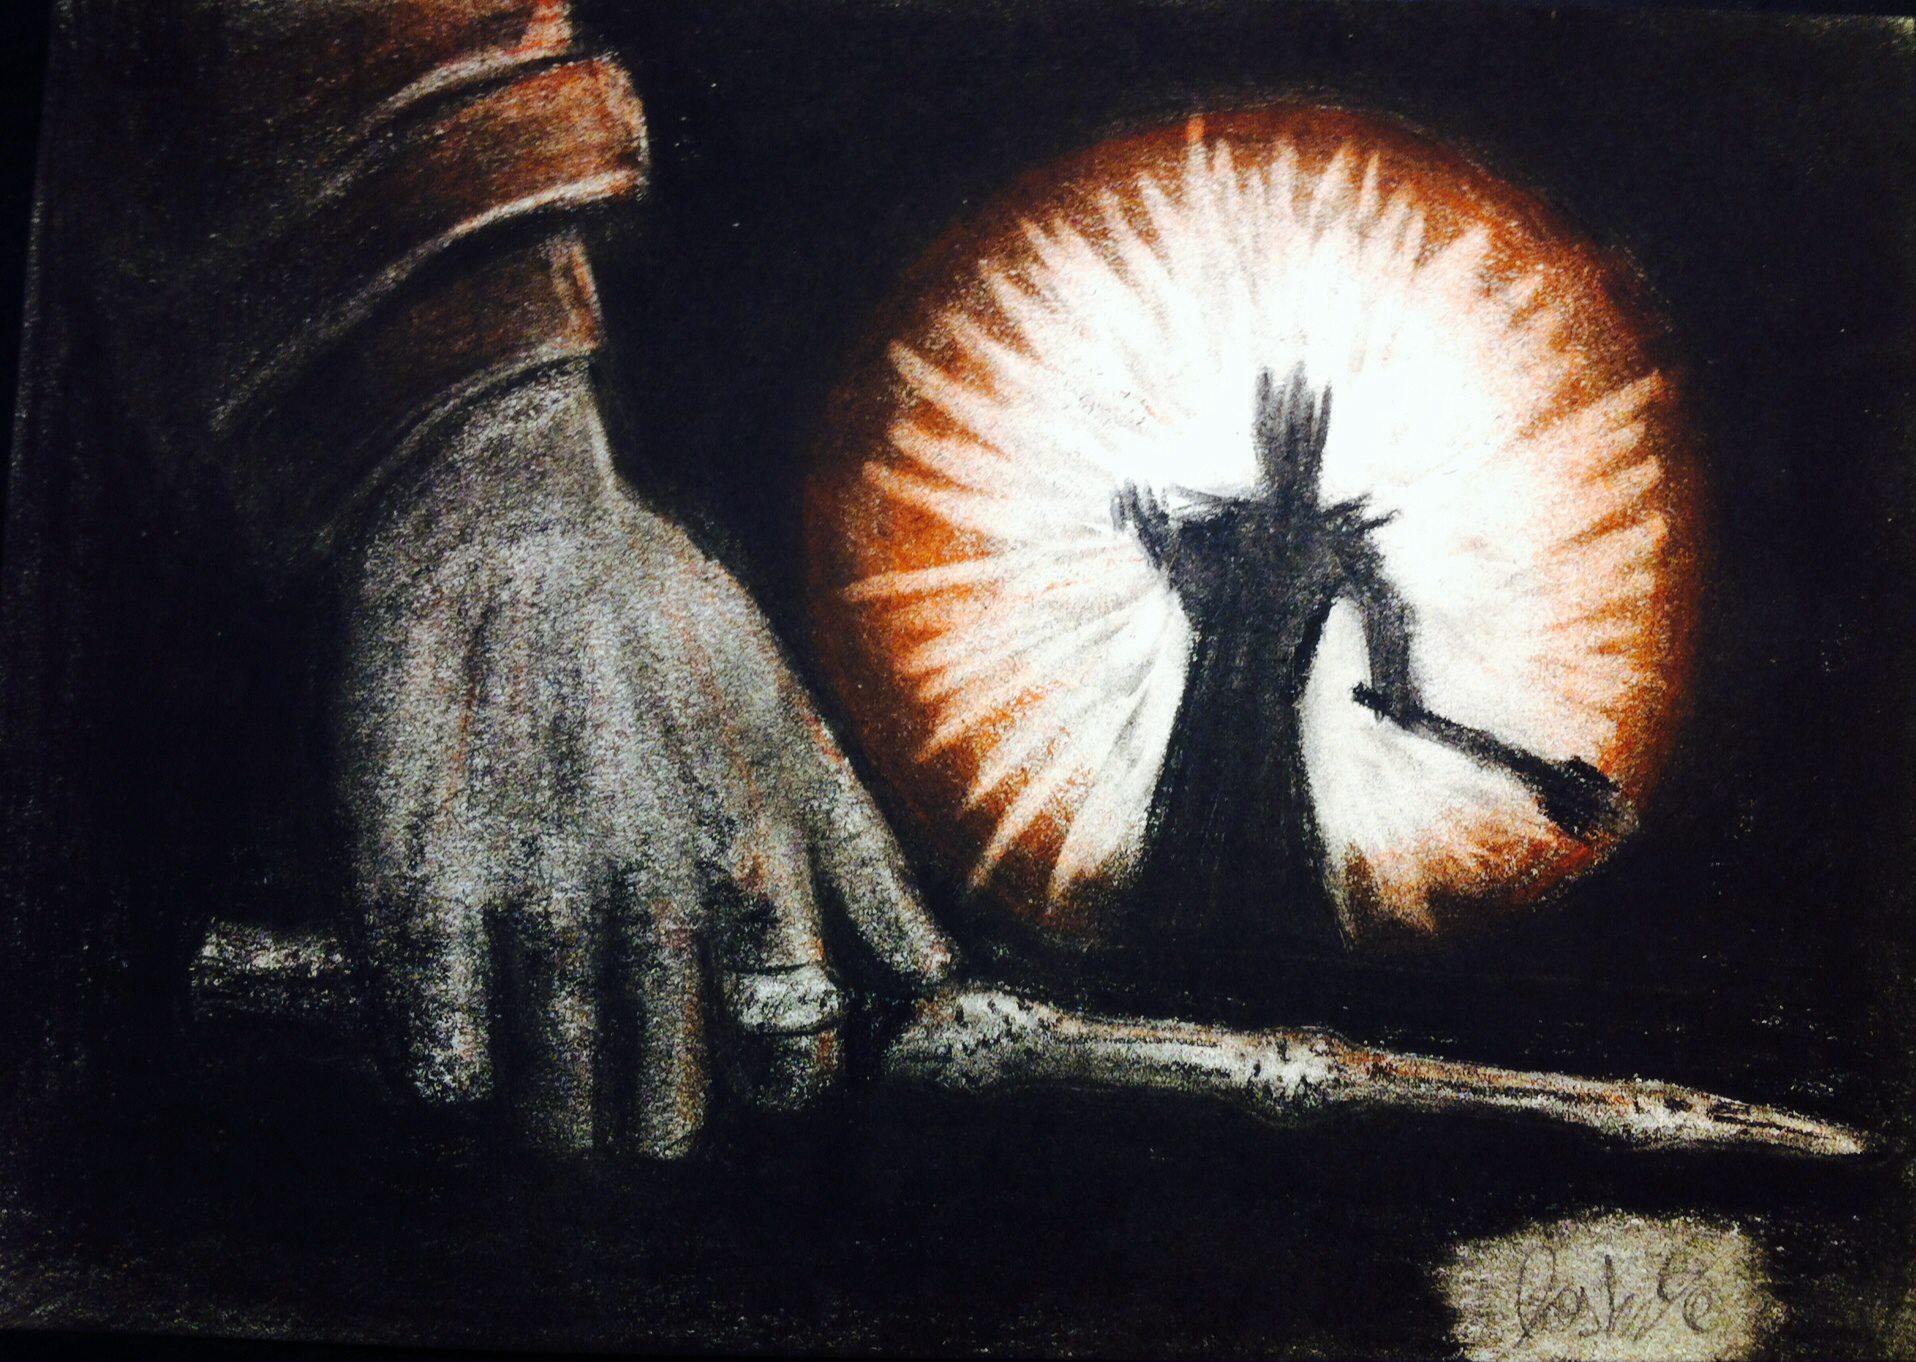 Sauron upon Hogwarts cotmloth